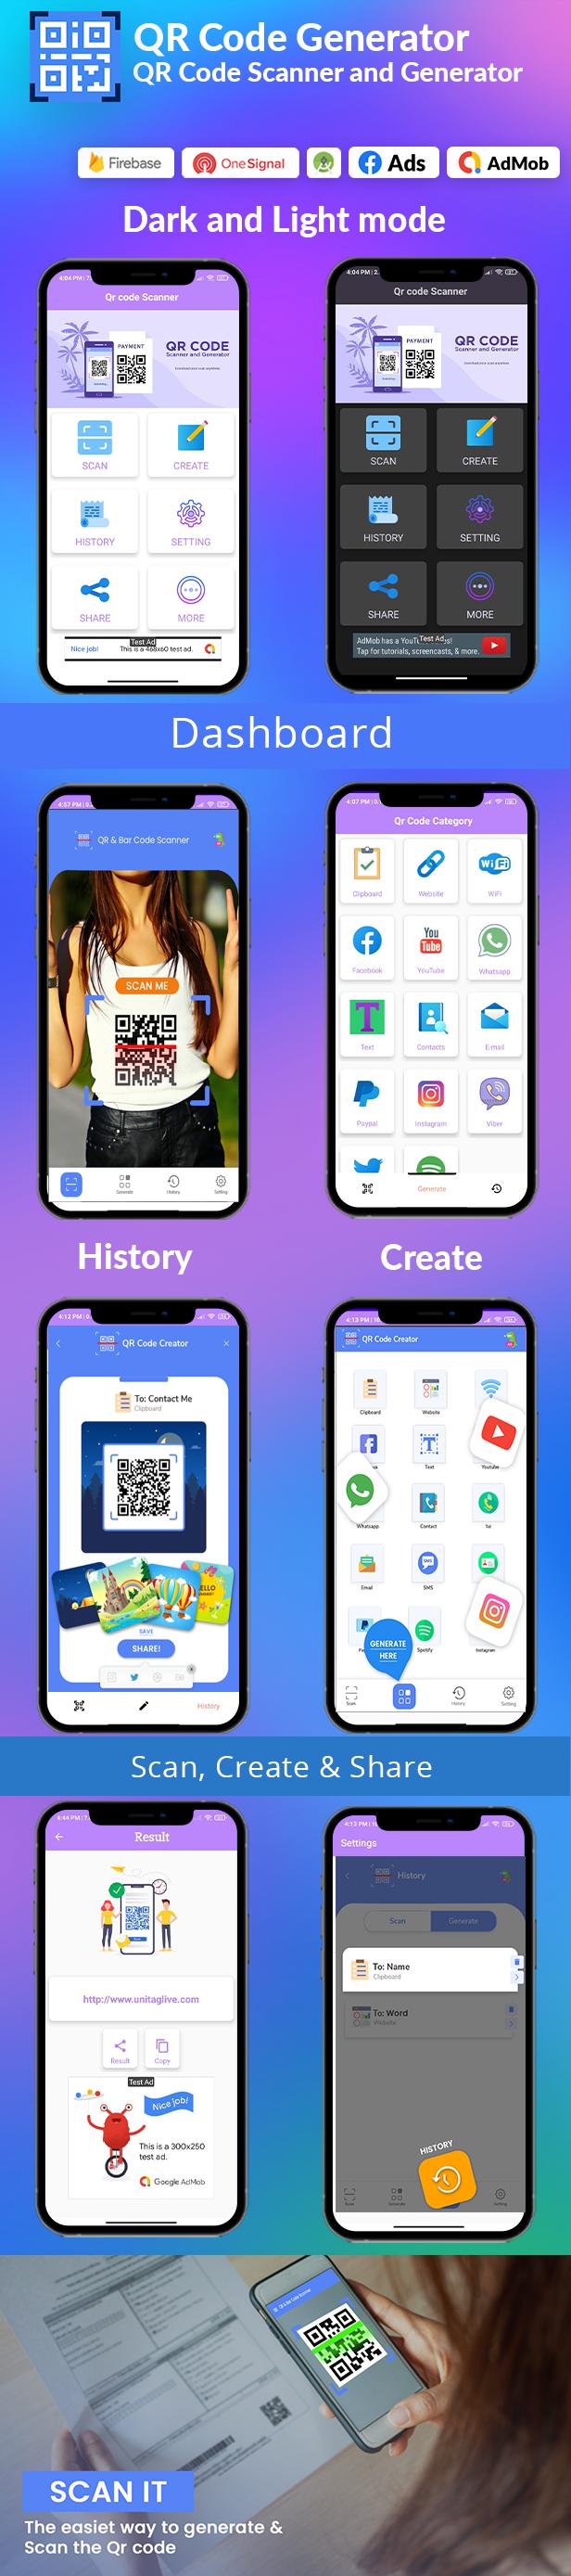 QR Code & Barcode Scanner & Generator Android | Admob, Fb, Startapp - 3